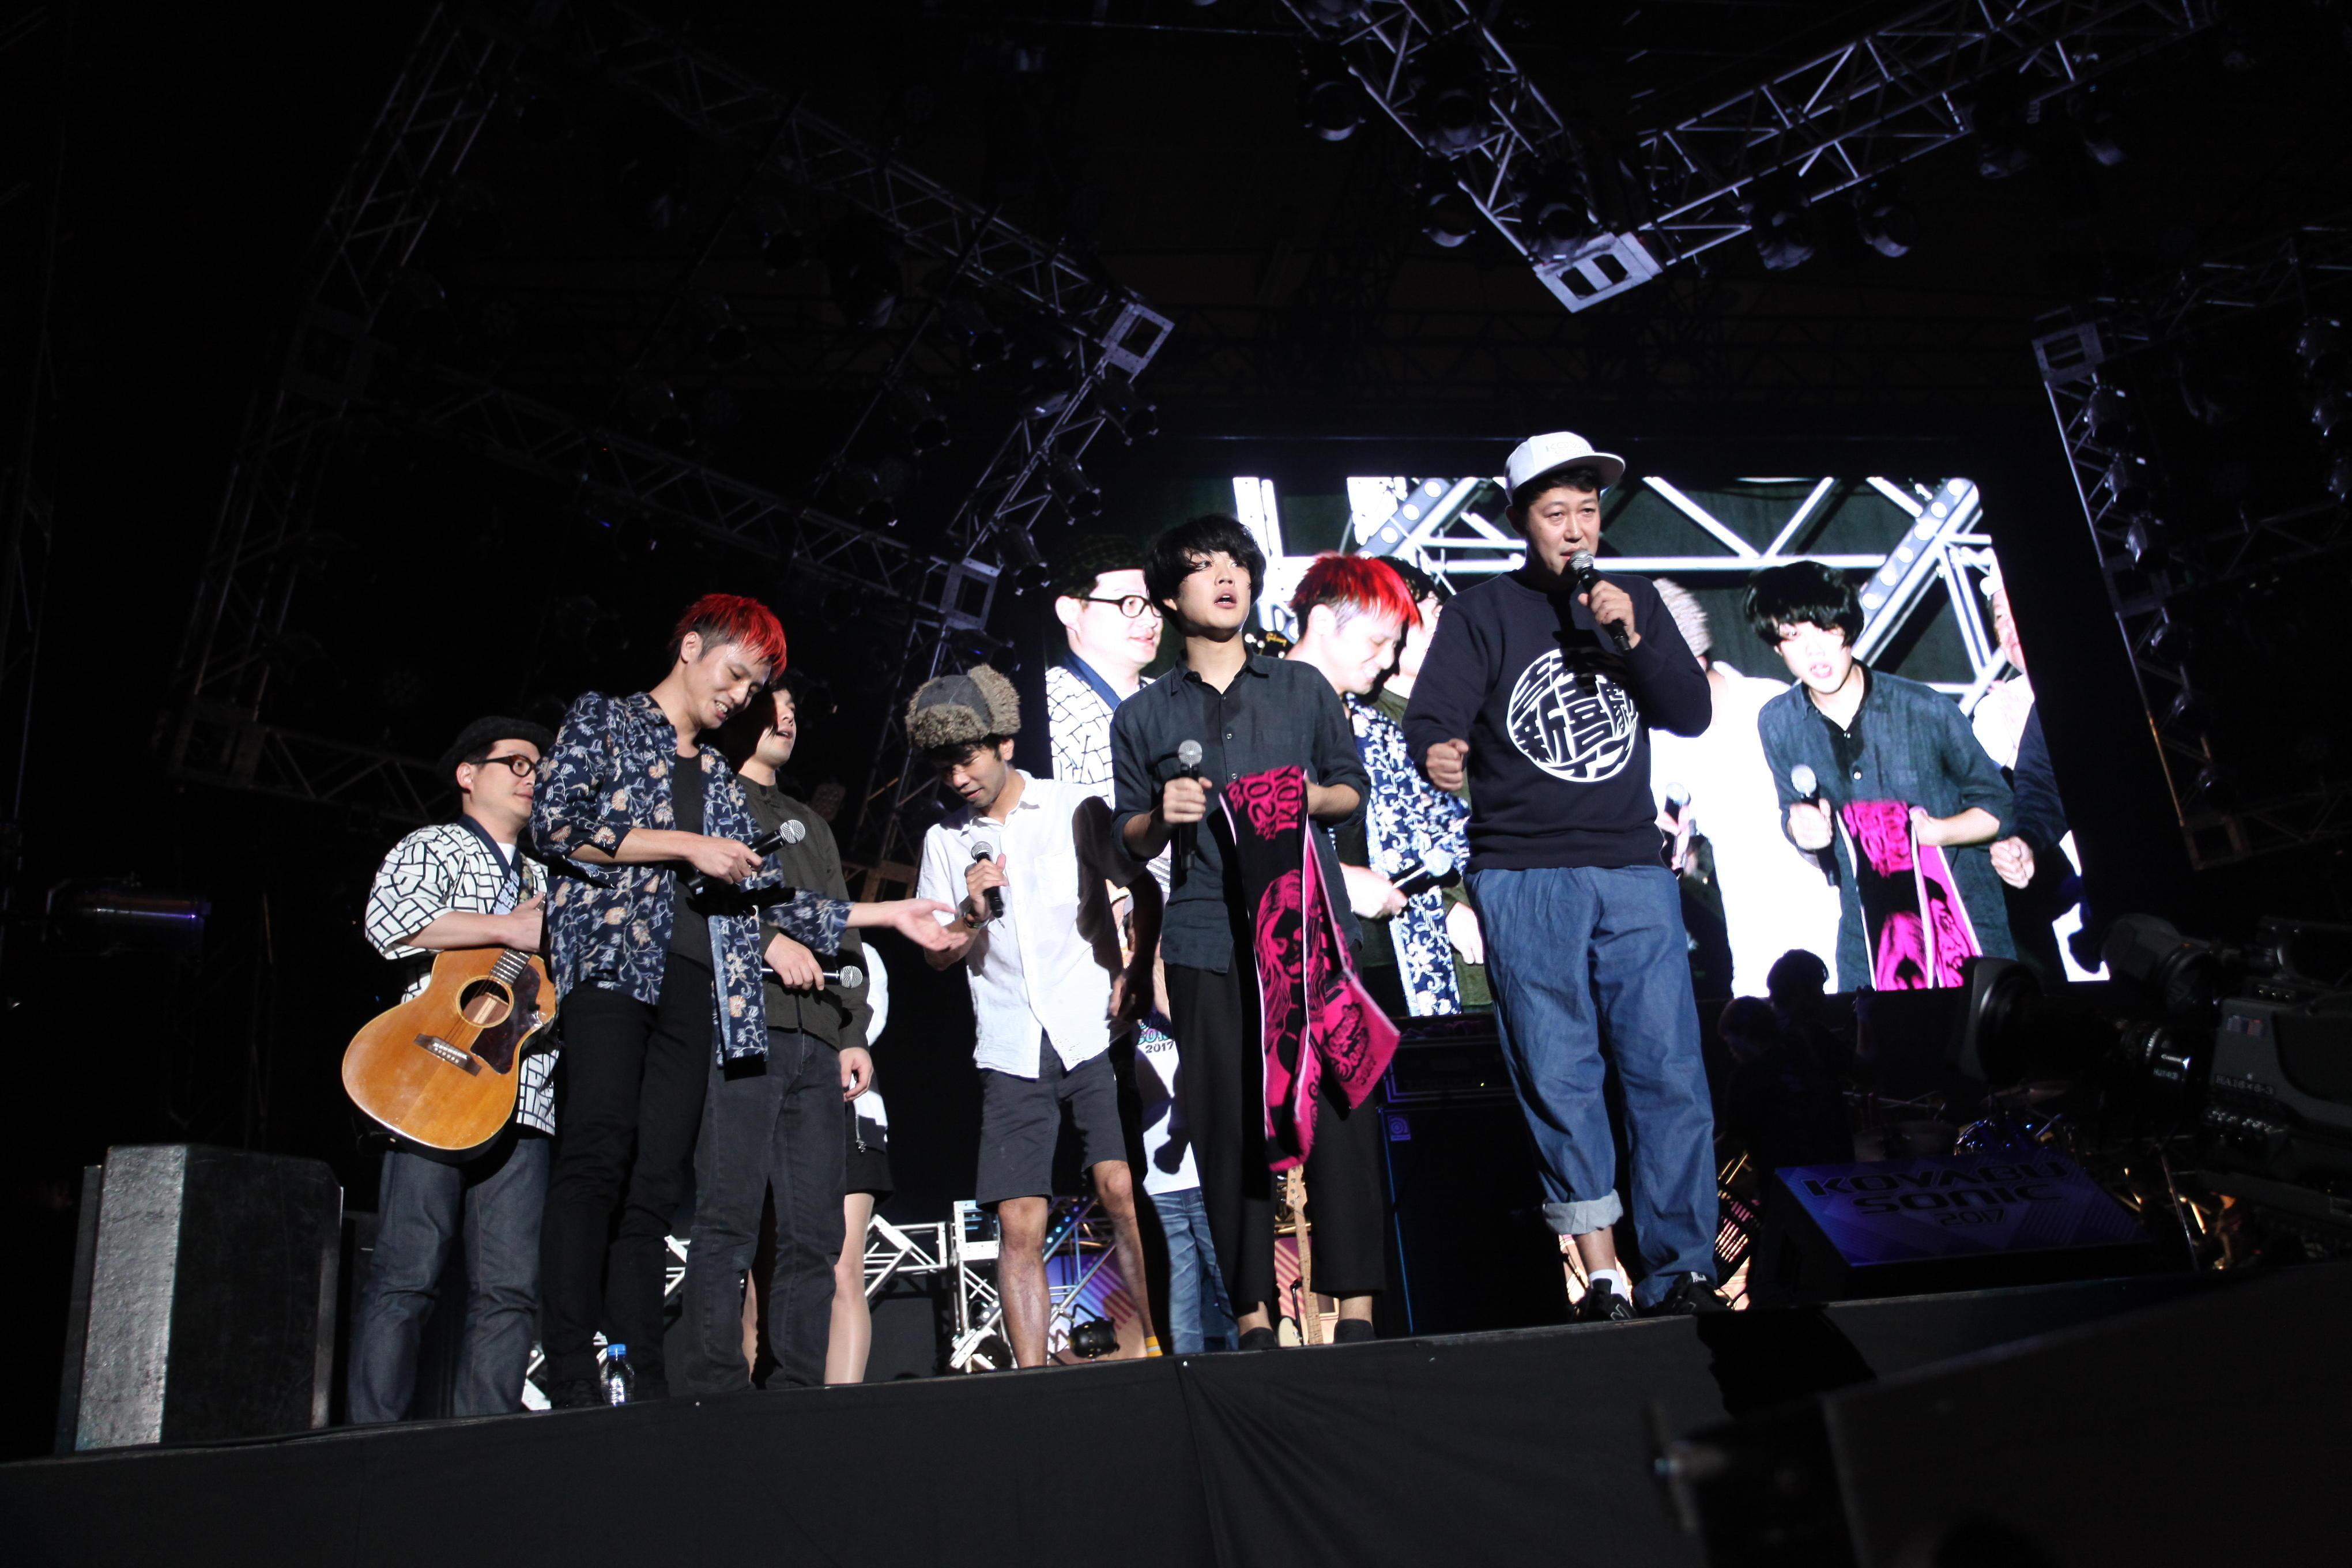 http://news.yoshimoto.co.jp/20171106132214-c54096026a444eb09b811480be55043faf3be6b9.jpg